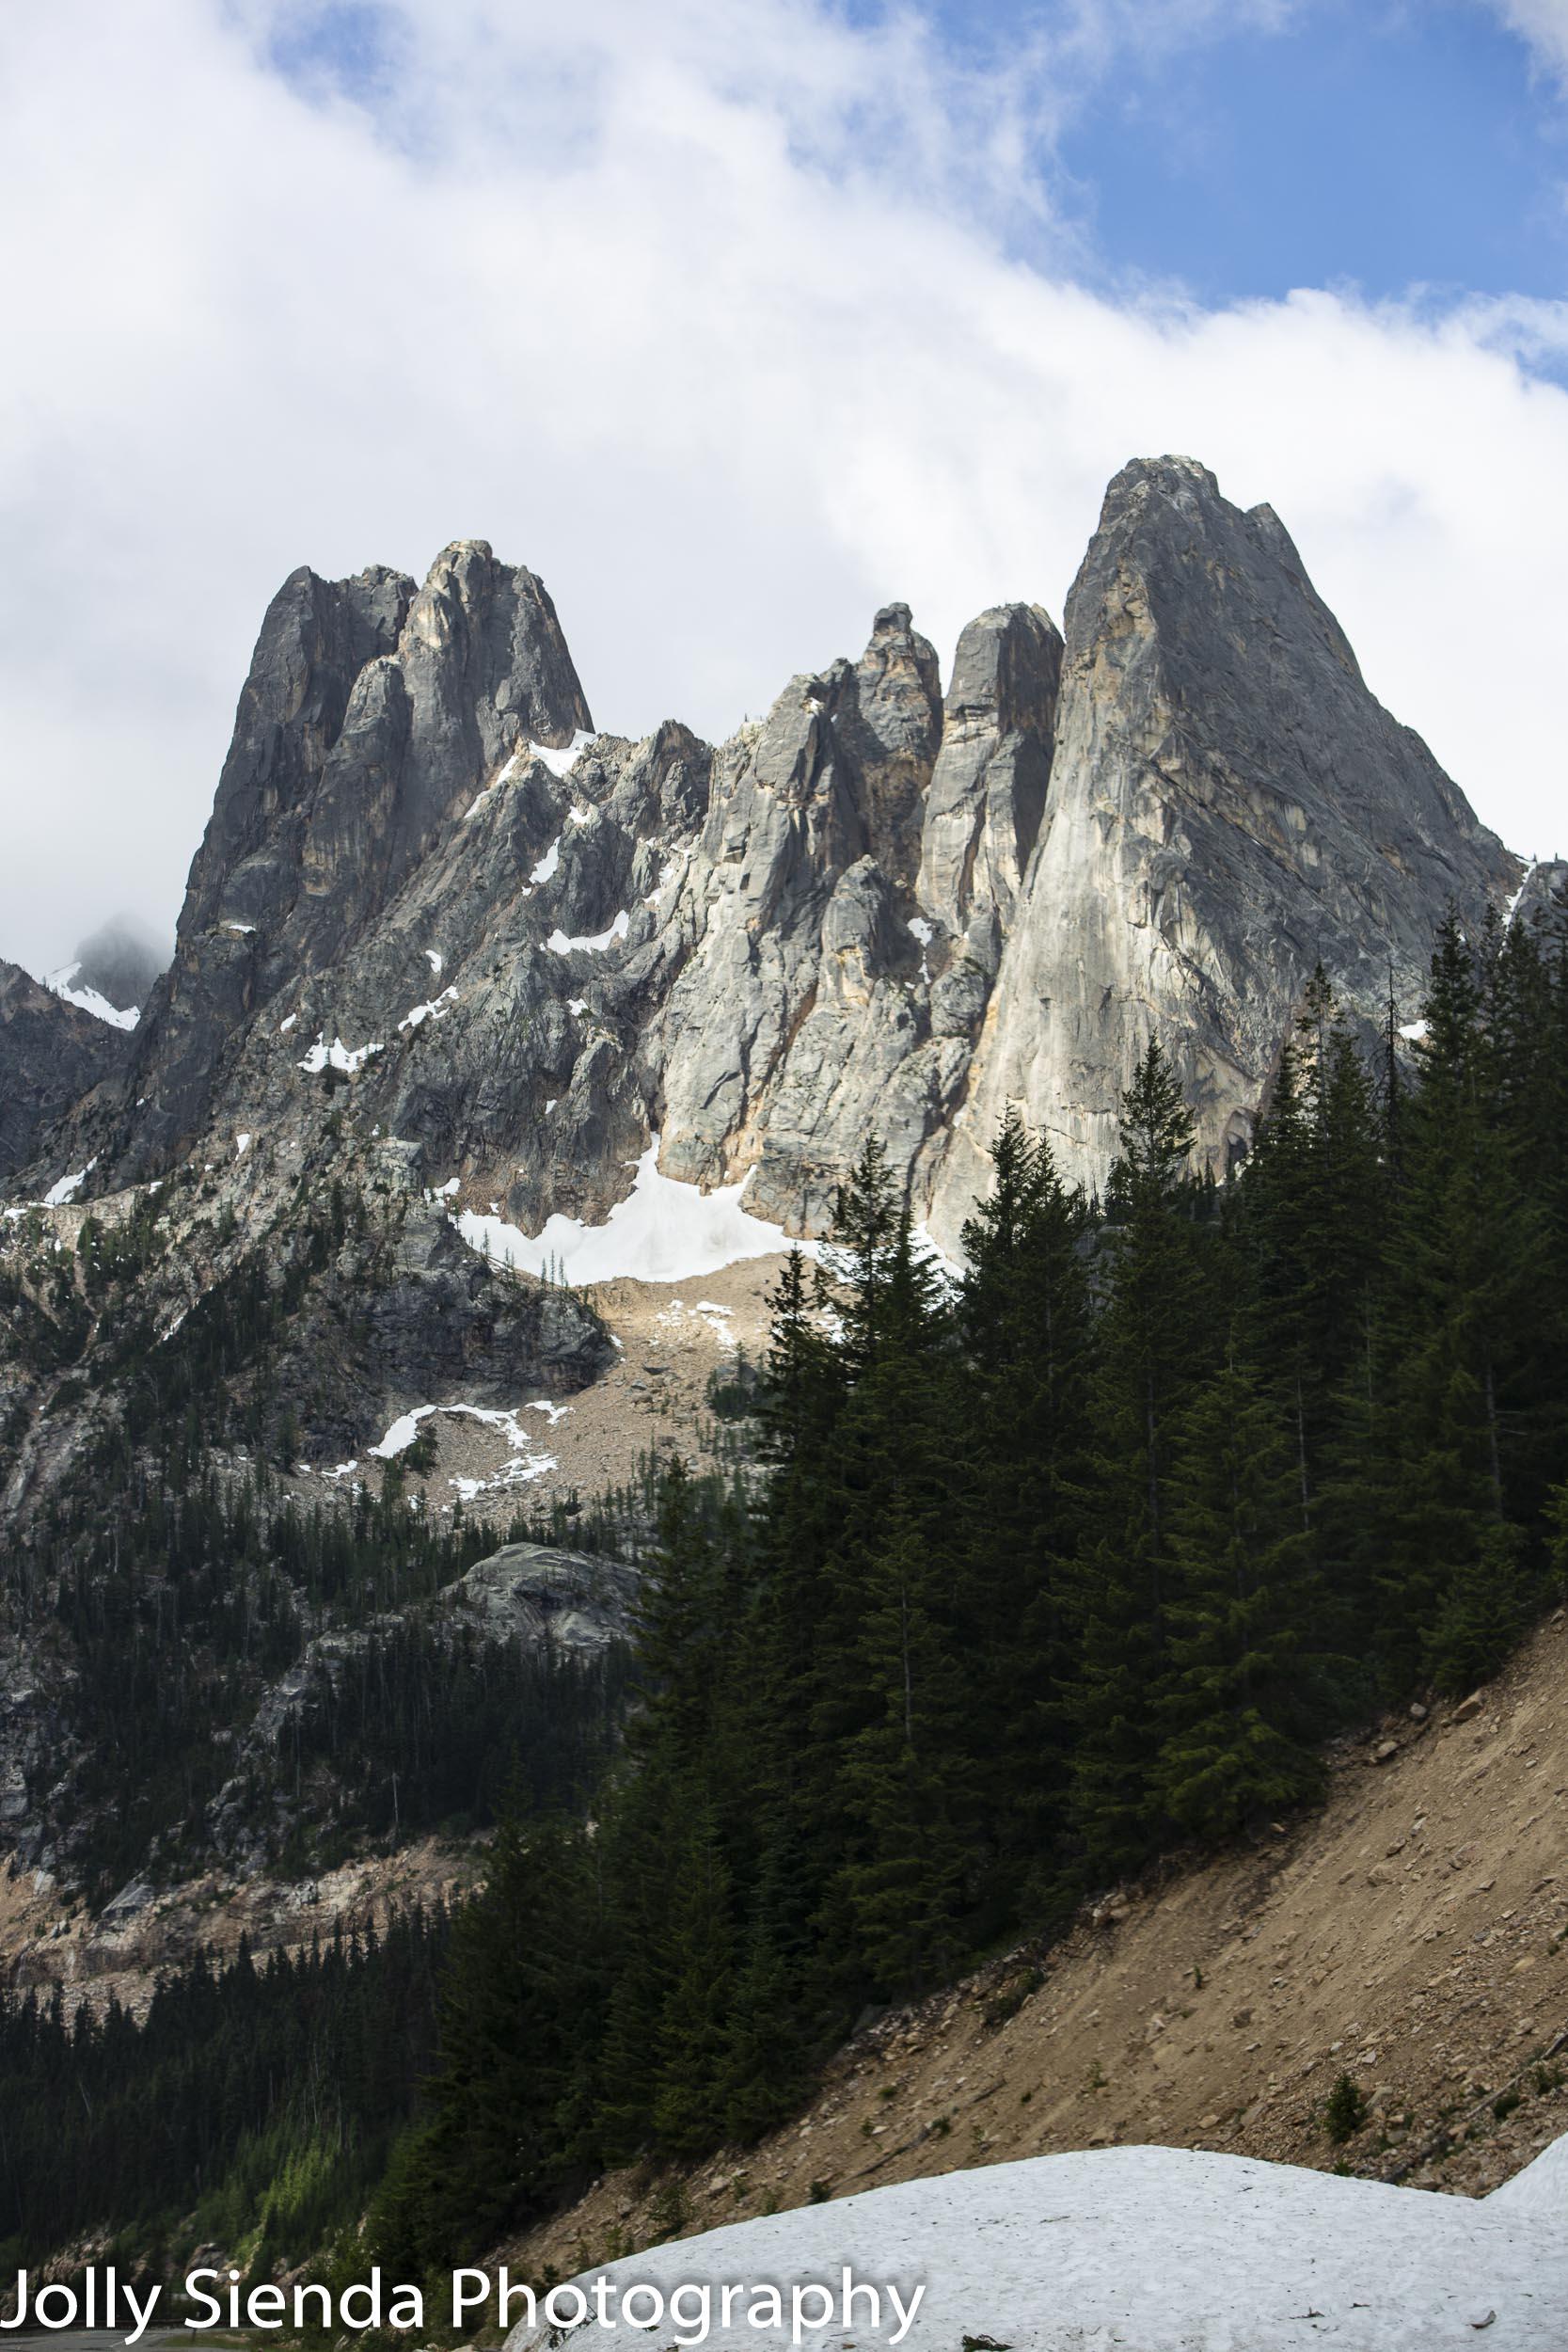 Twin peaks, Mount Shuksan, North Cascade Mountains